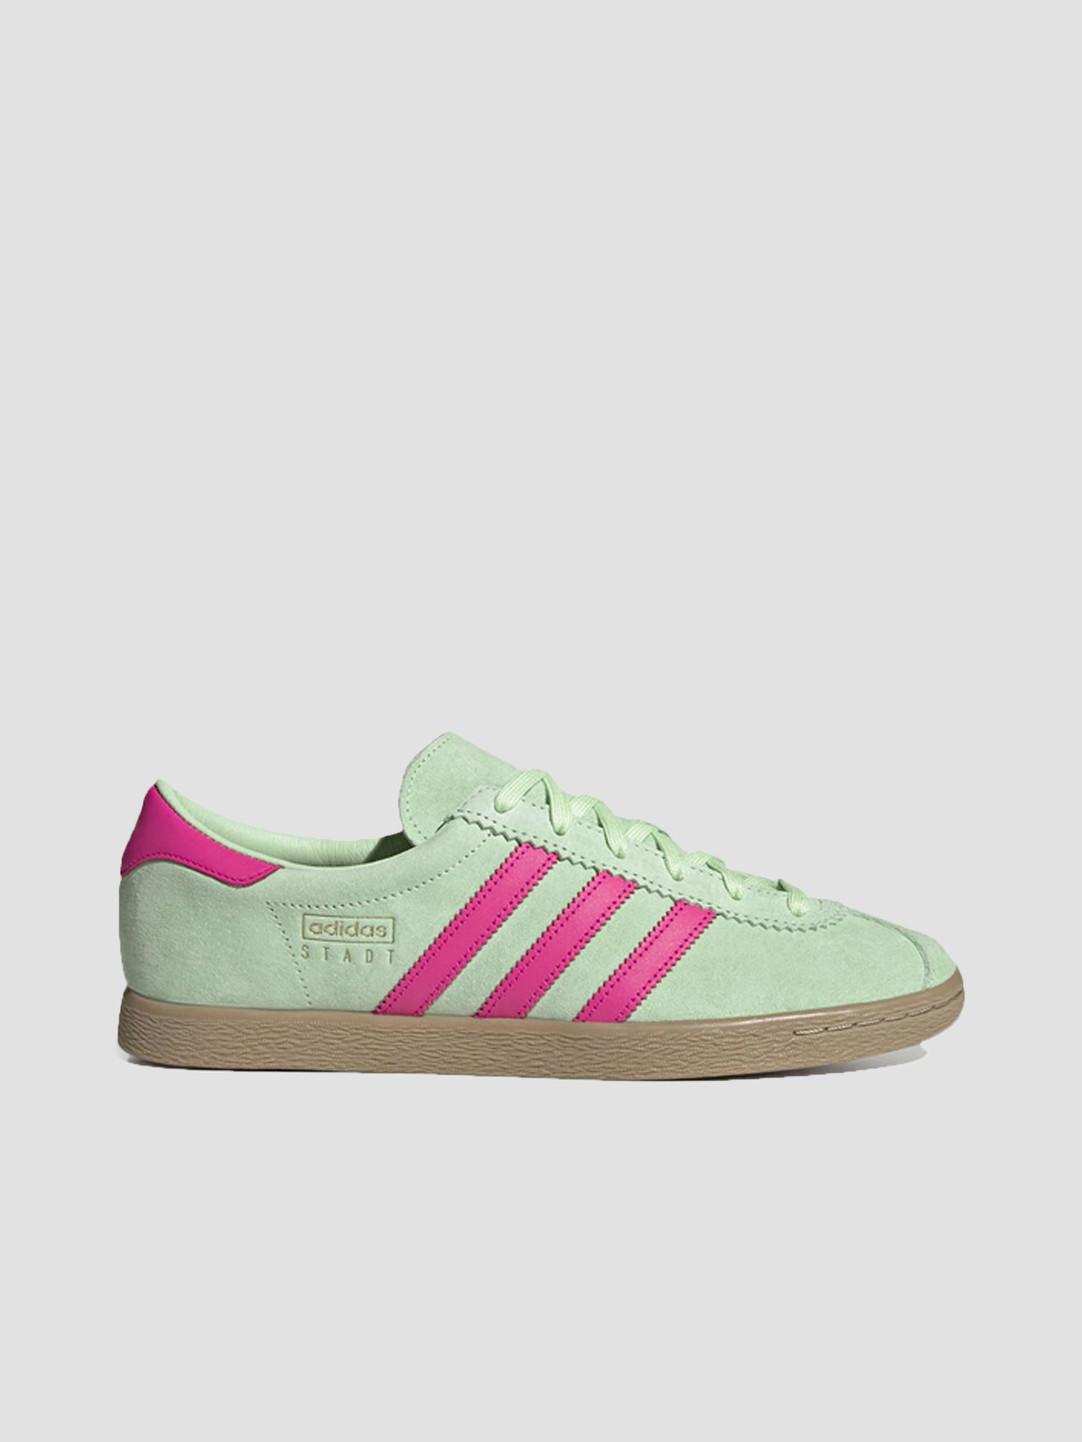 adidas adidas Stadt Glogrn Shopnk Goldmt EE5726